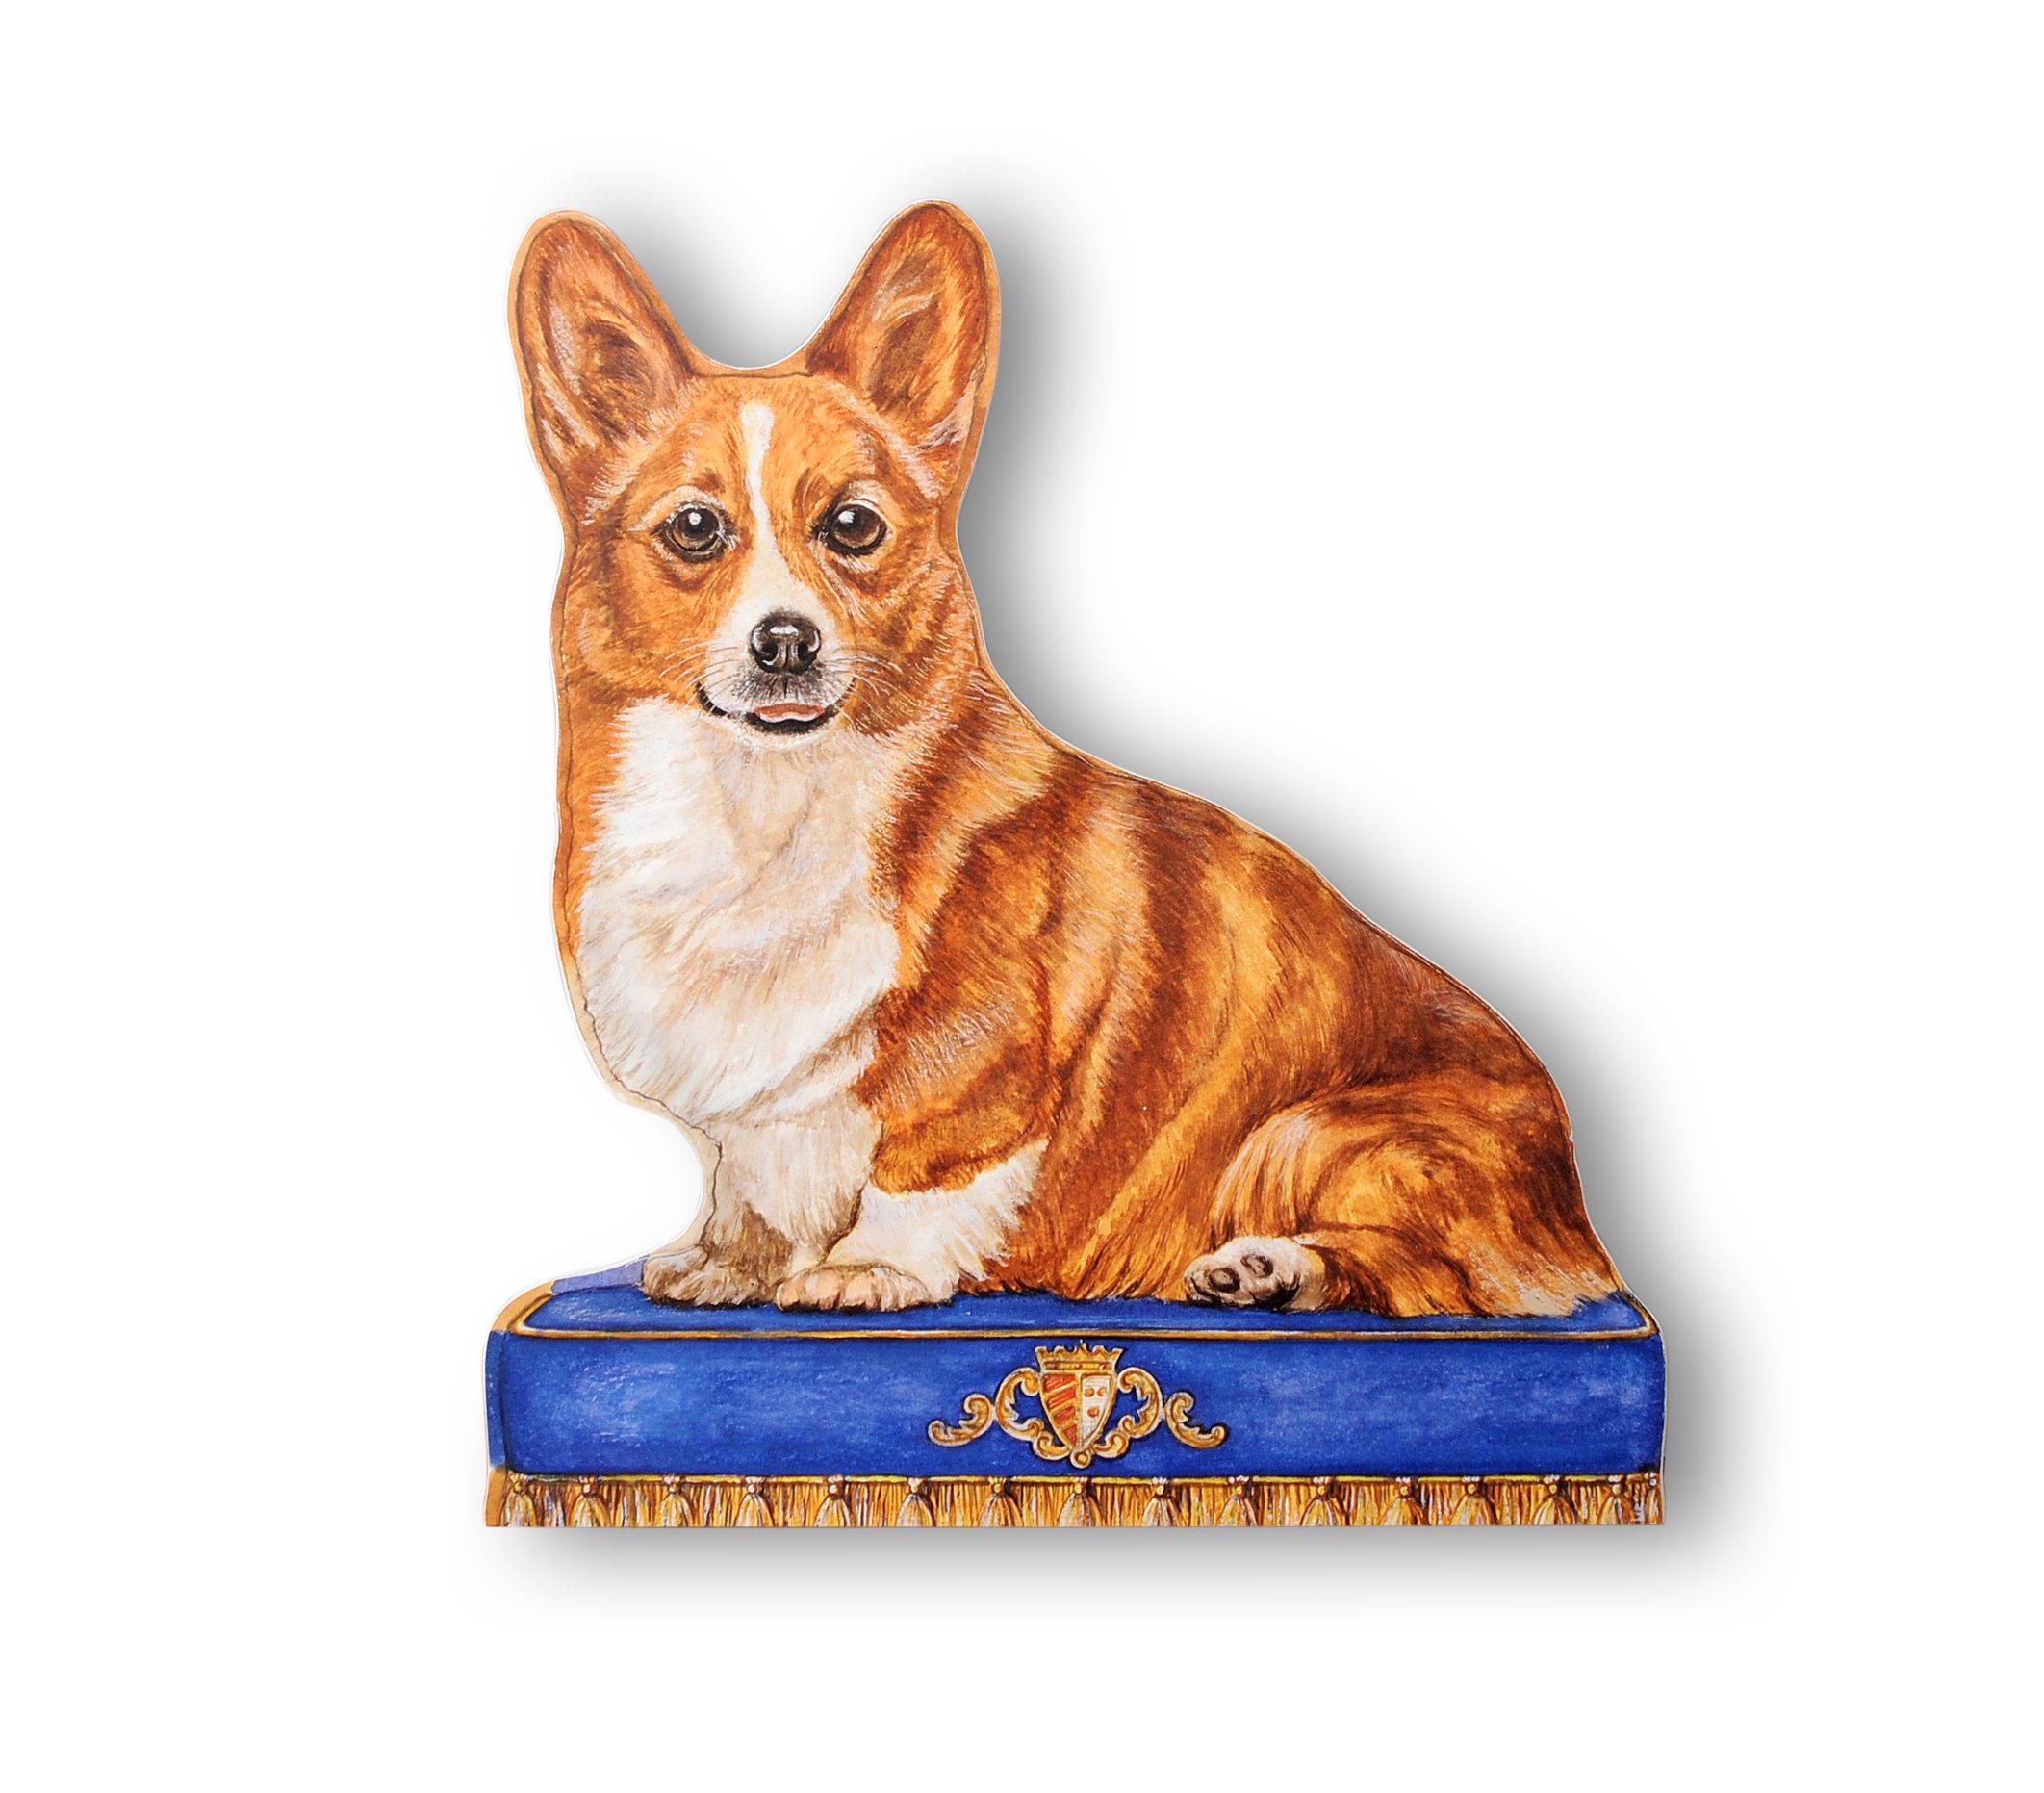 Stupell Home Décor Corgi Decorative Dog Door Stop, 15 x 0.5 x 13.5, Proudly Made in USA